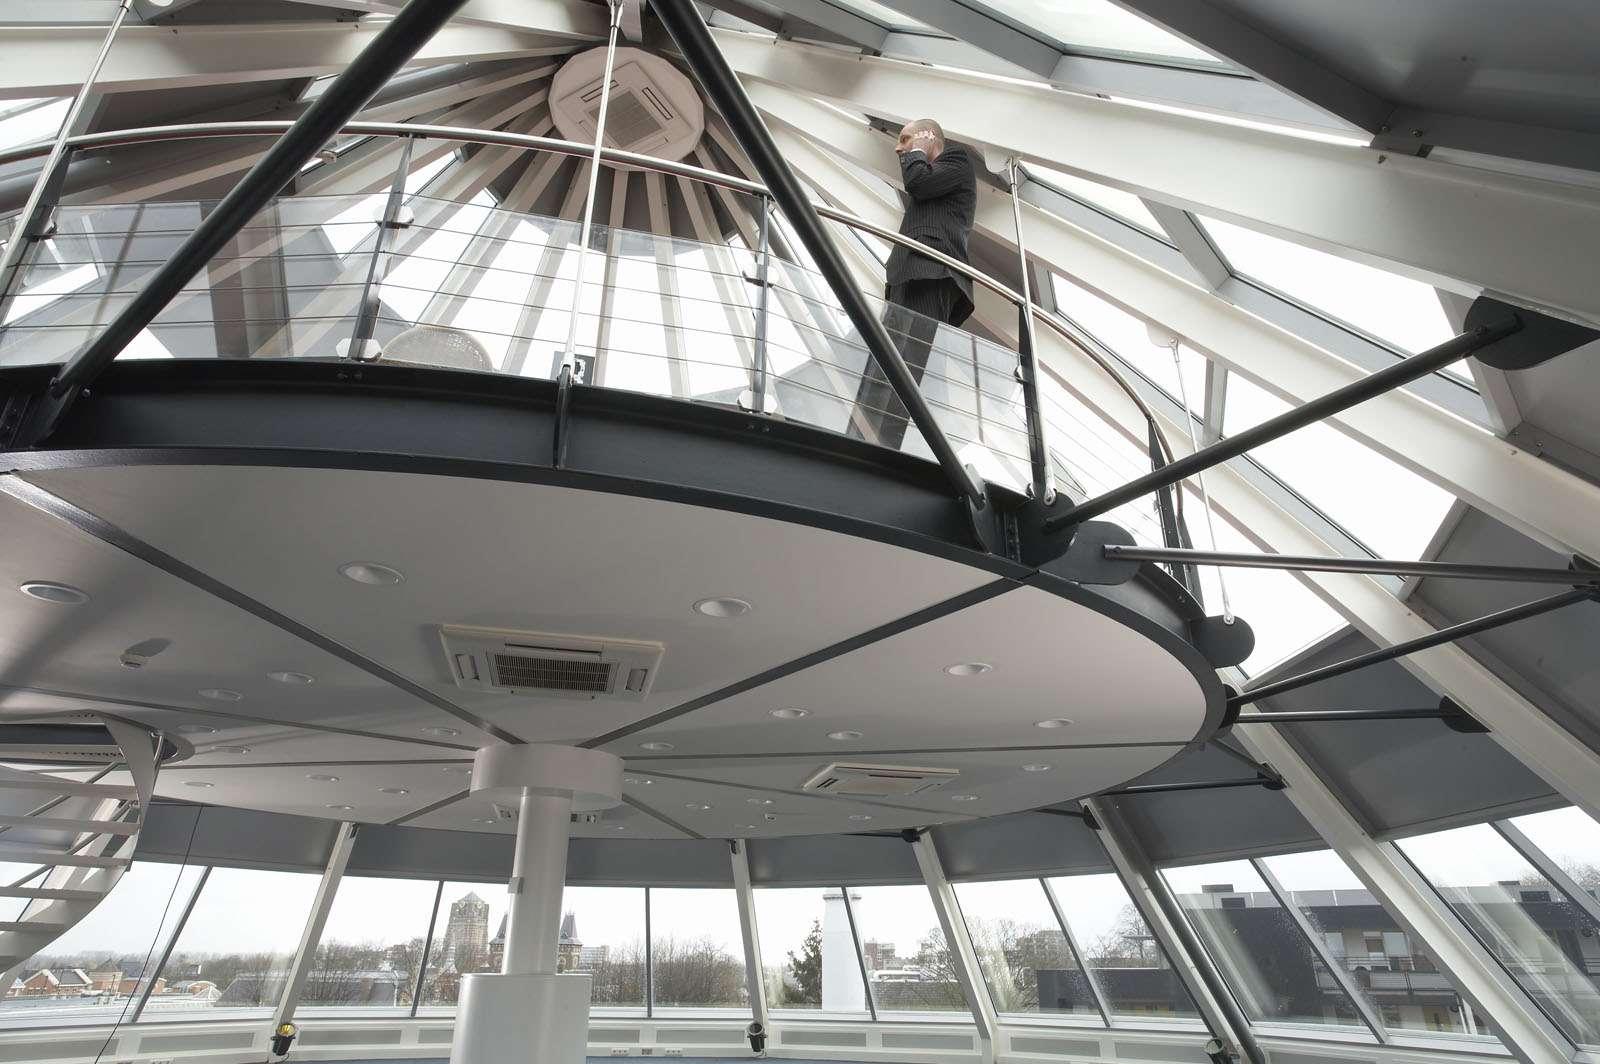 airco openbare ruimte. airvek airconditioning, Meubels Ideeën